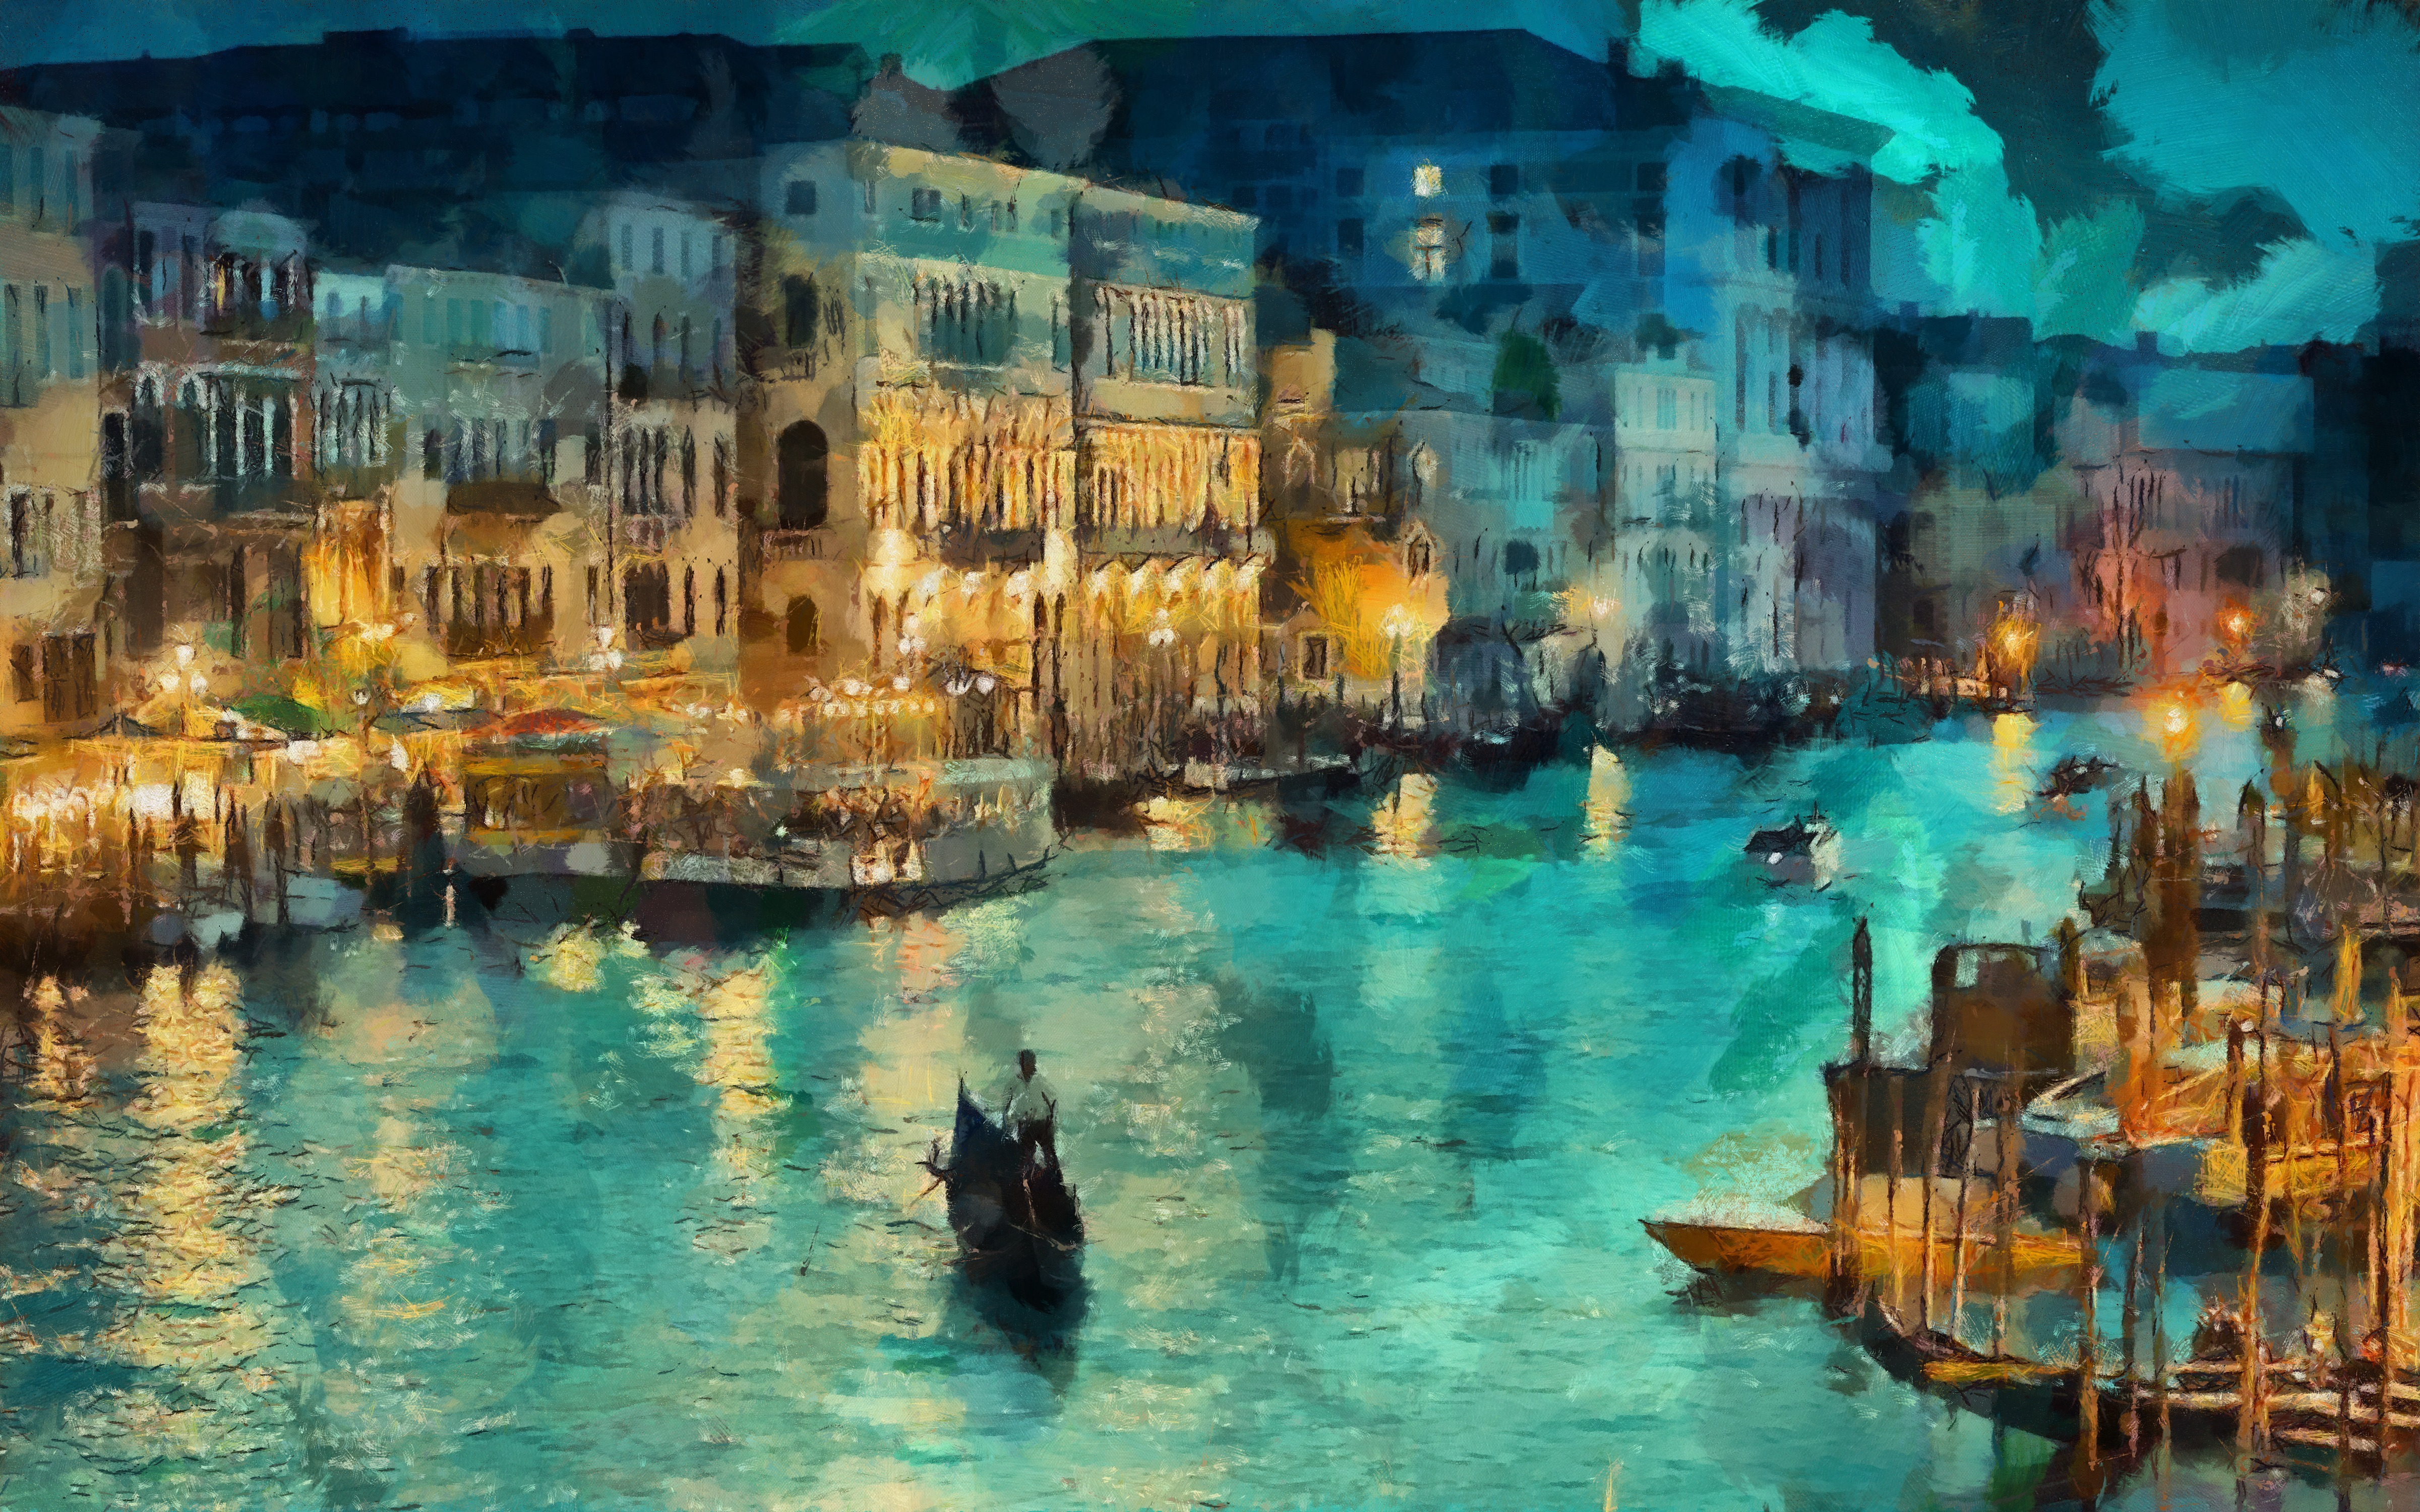 523576 noch veneciya ogni kanal svet lodki italiya doma a 4800x3000 www.gde fon.com